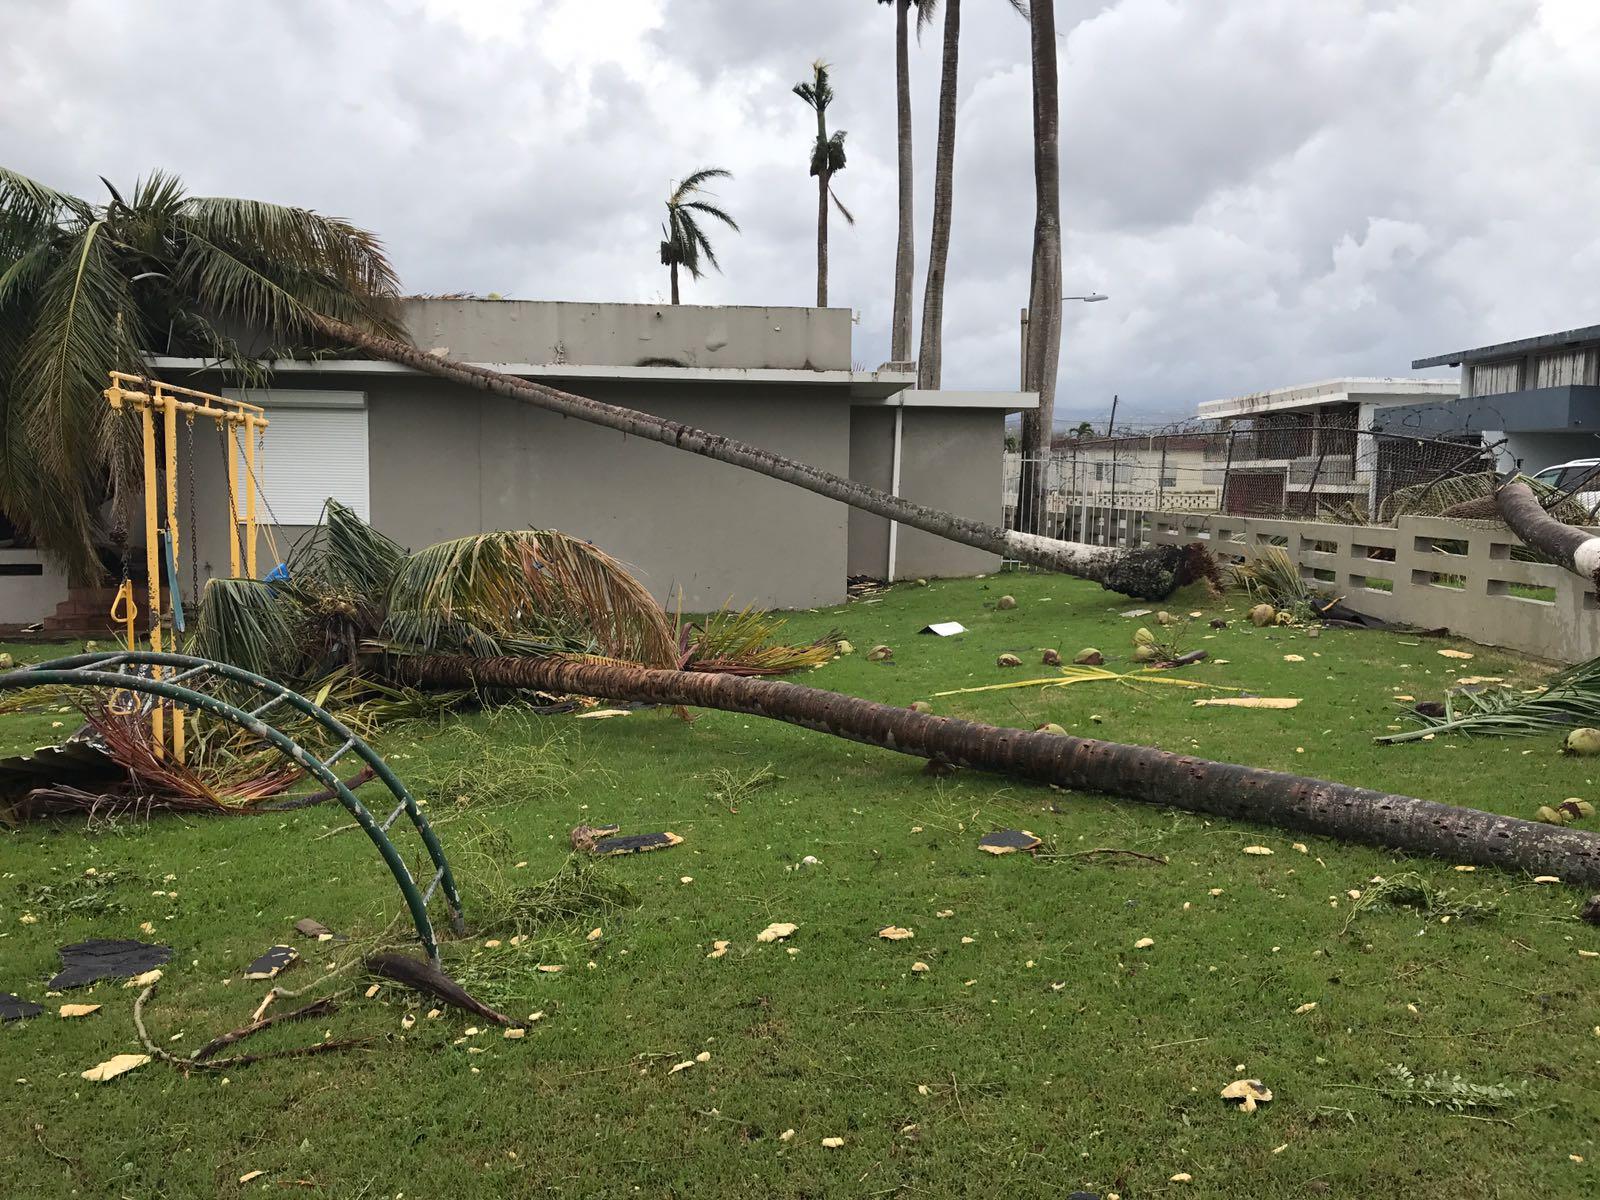 Downed trees in the Cangus neighborhood